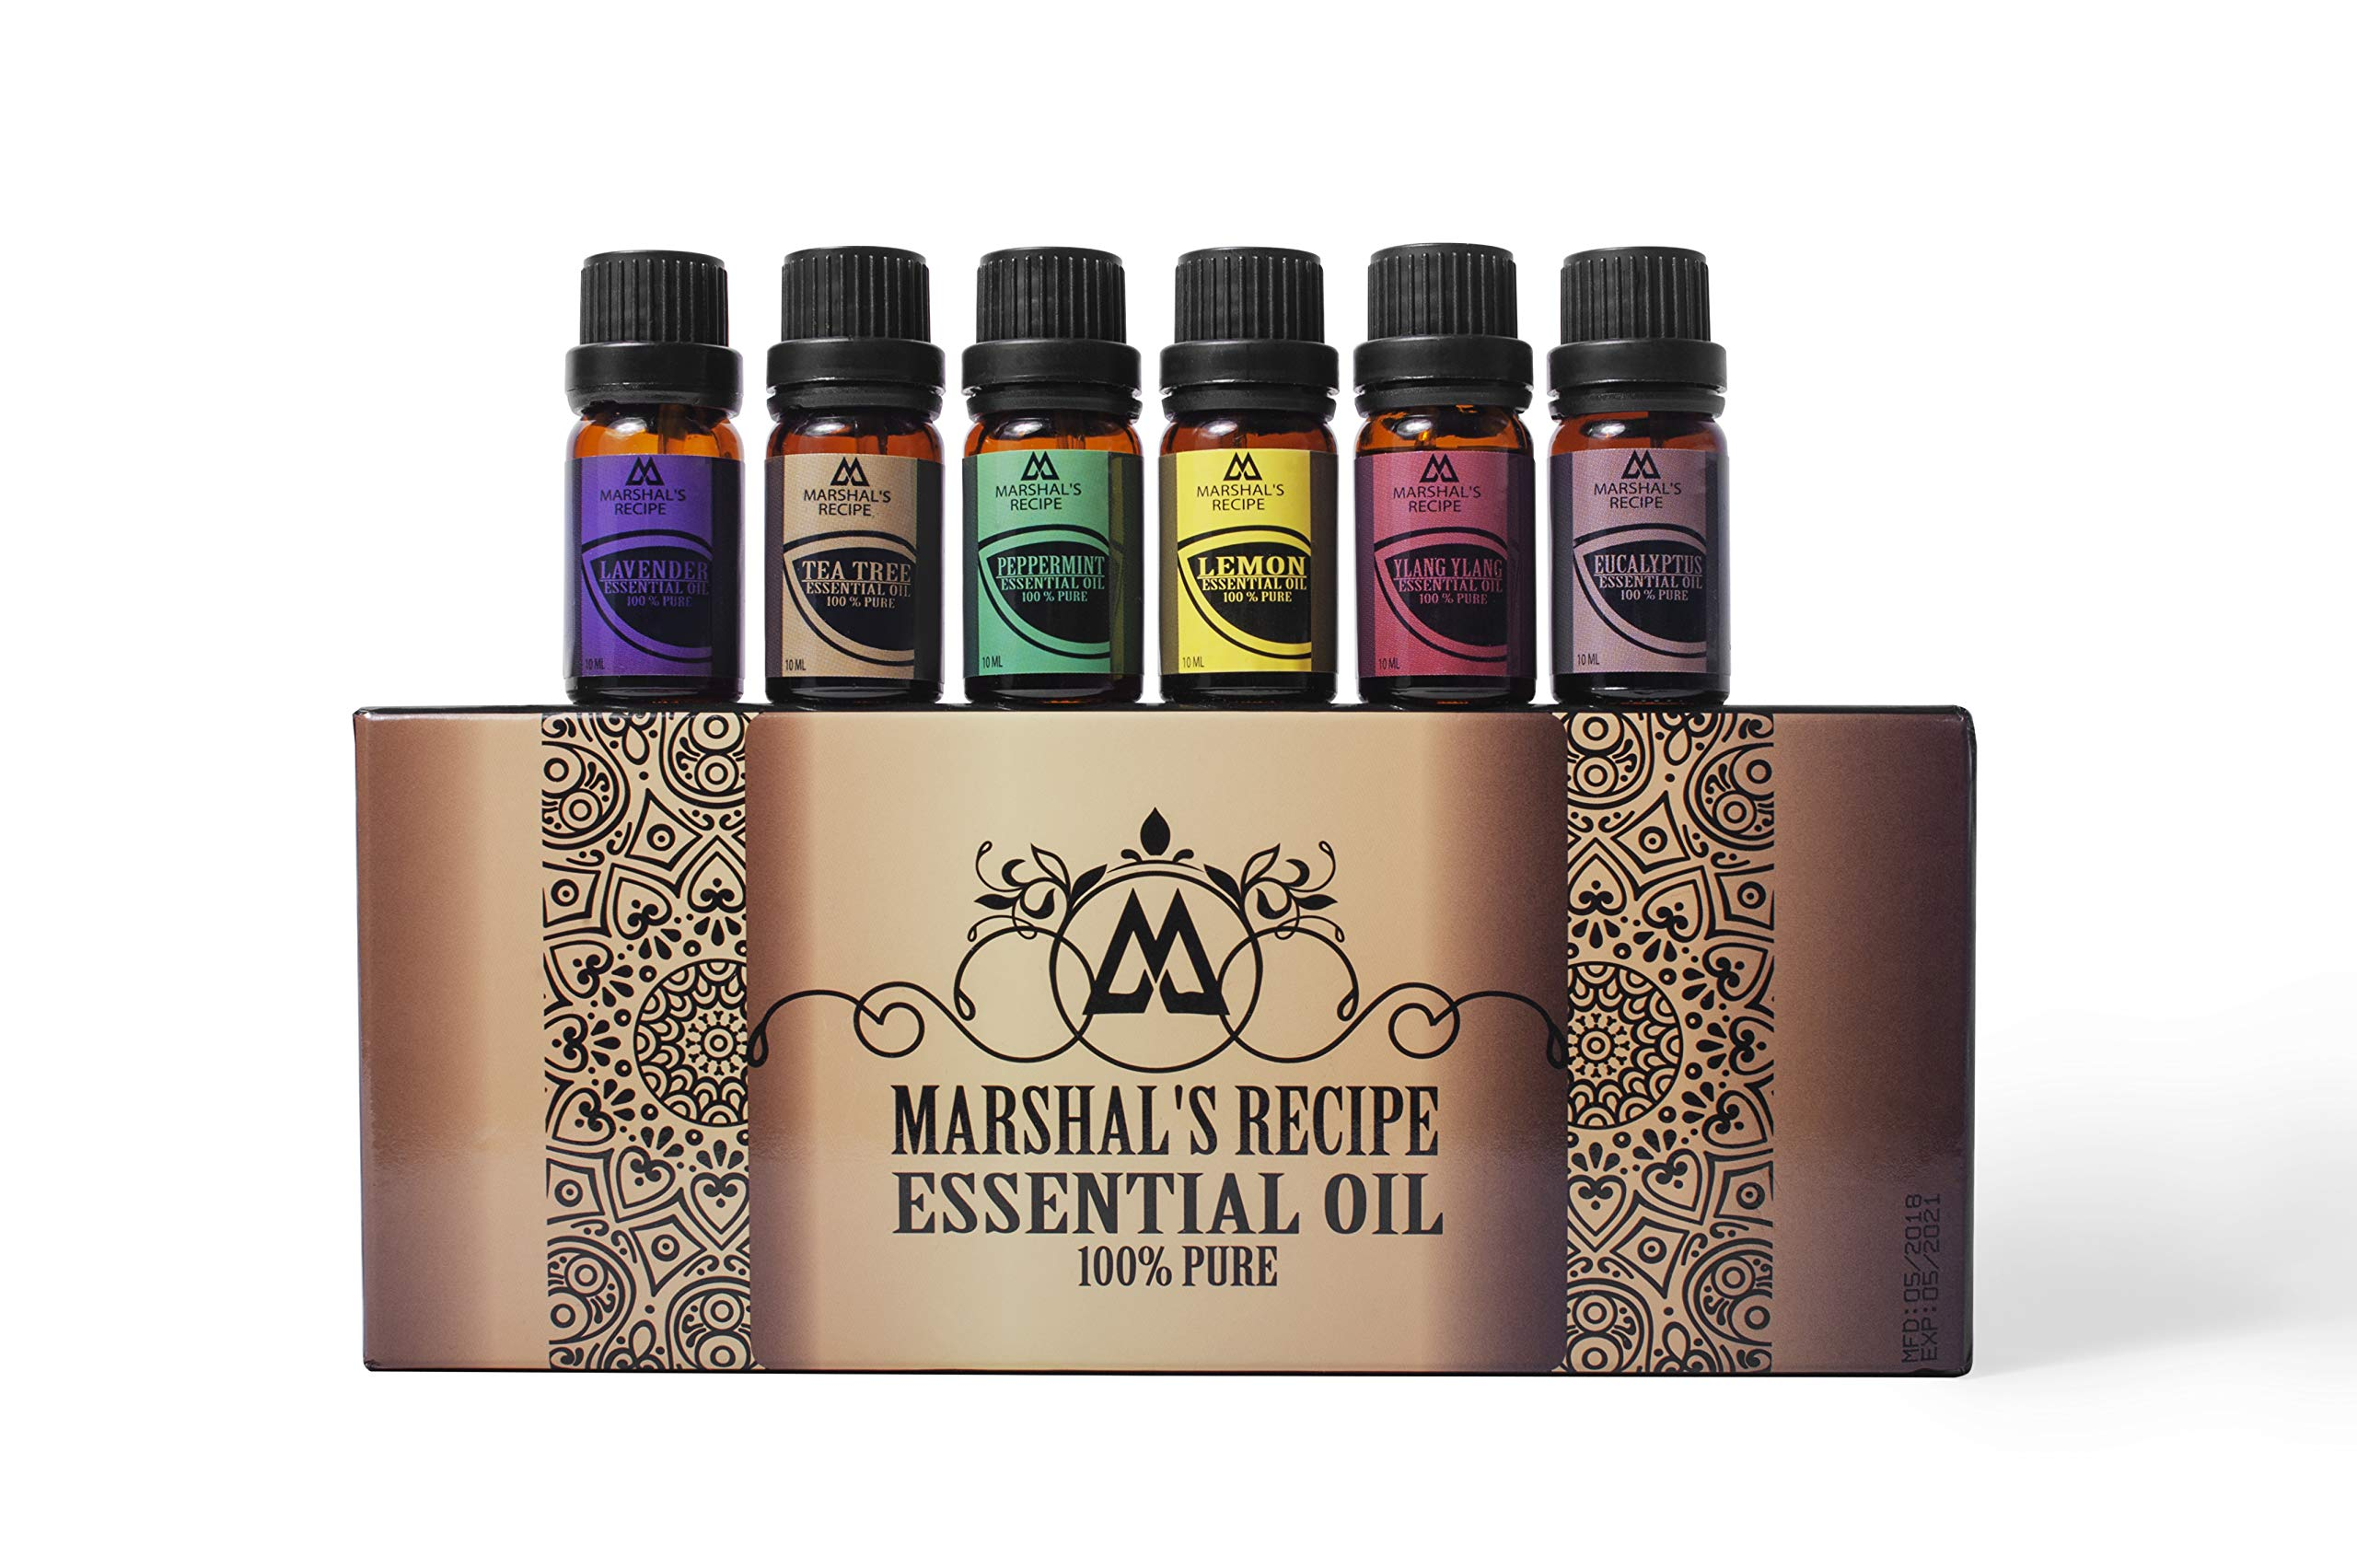 Marshal\'s Recipe Organic Essential Oil Kit (6 x10ml) - Six Aromas of The Highest Quality Tea Tree, Eucalyptus, Lavender, Ylang Ylang, Lemon and Peppermint